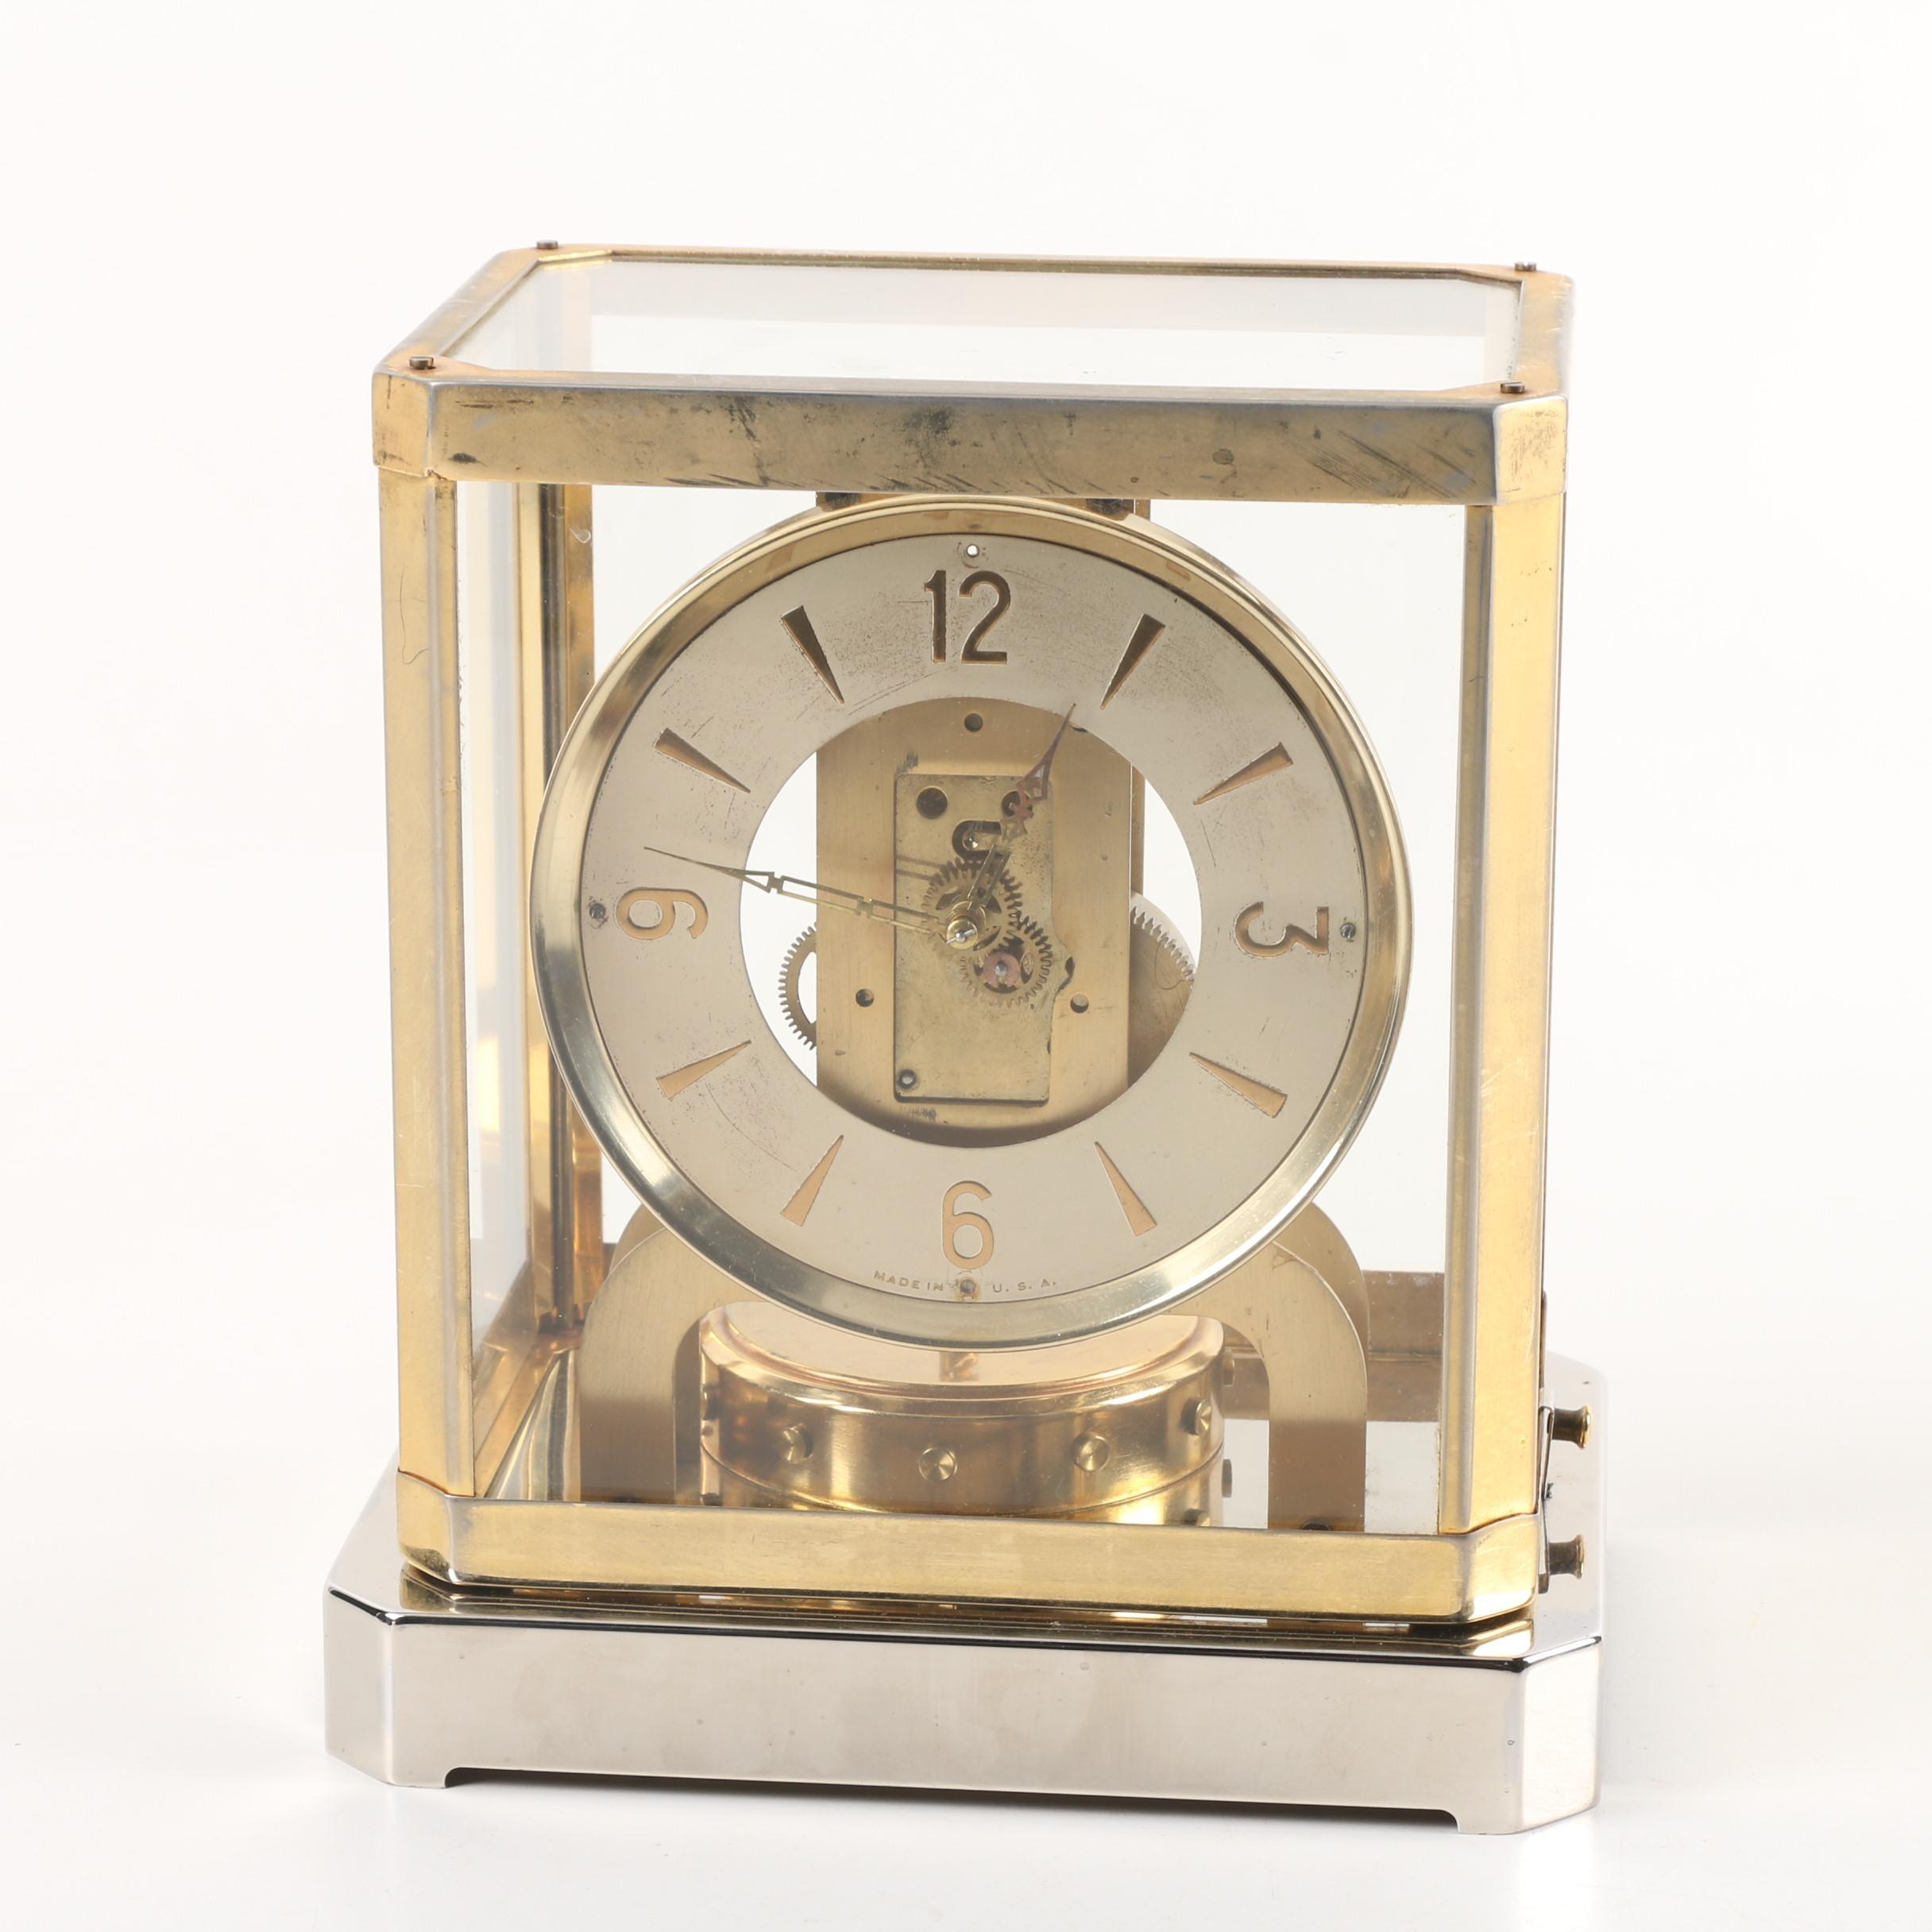 Brass and Glass Anniversary Clock